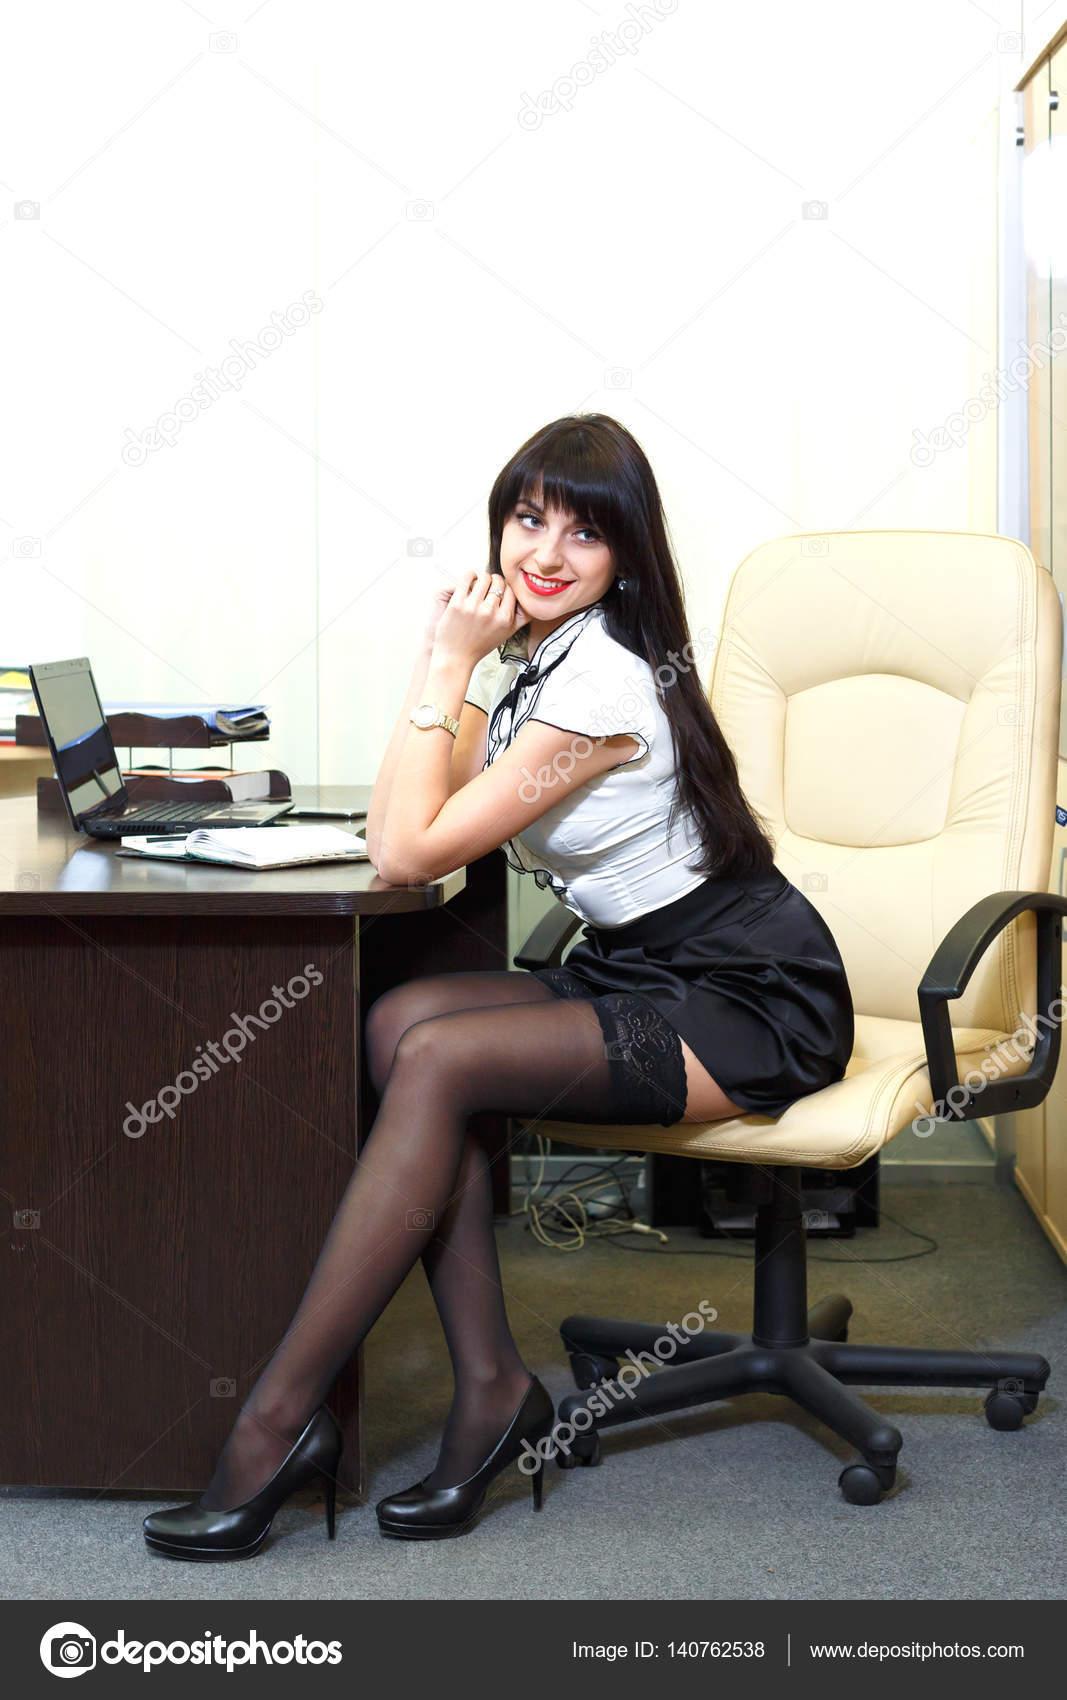 a8364597ae4 사무실에 직장에 앉아 검은 스타킹에 젊은 섹시 한 여자 — 스톡 사진 ...